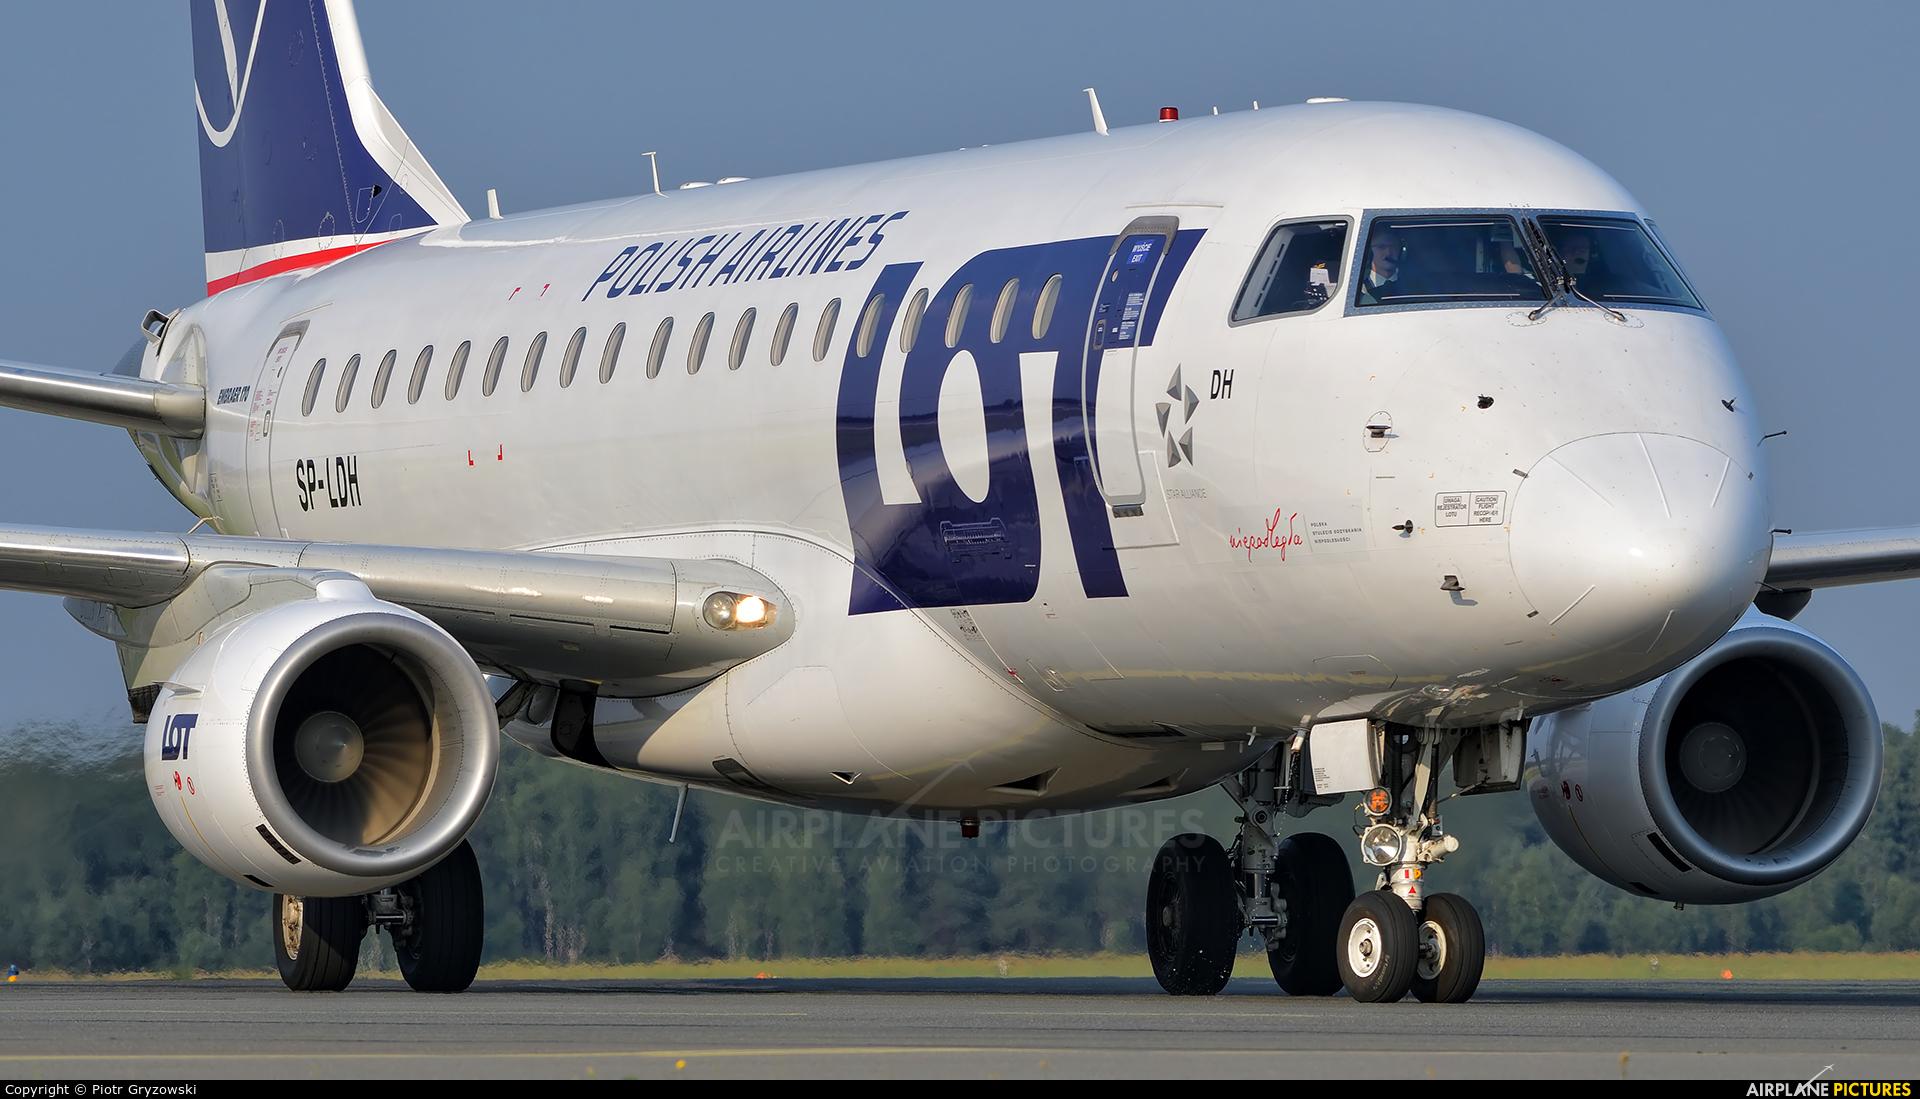 LOT - Polish Airlines SP-LDH aircraft at Katowice - Pyrzowice